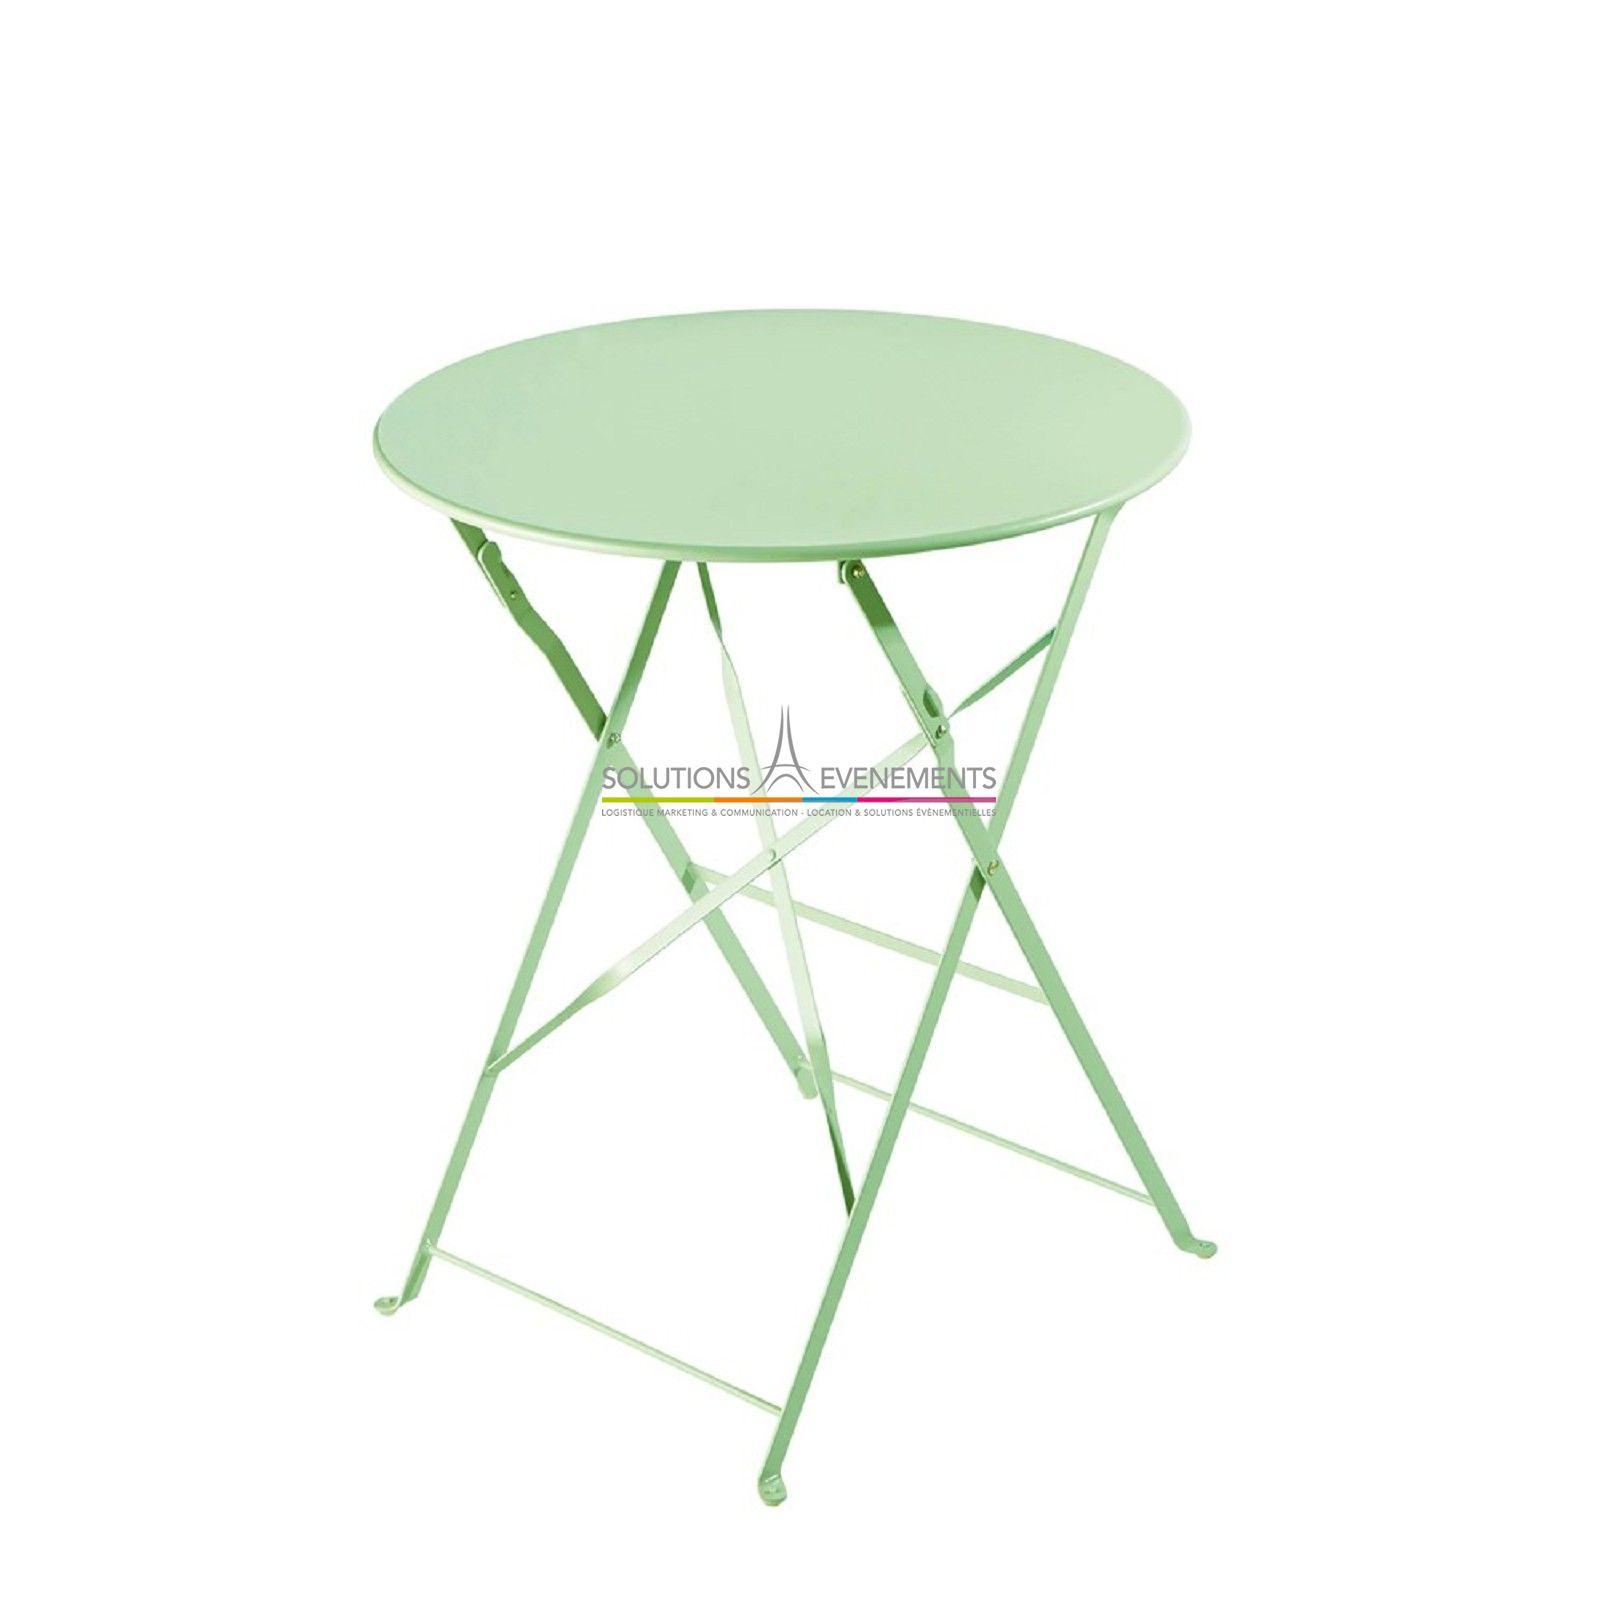 Location Table Jardin Metal Vert - Solutions Evenements encequiconcerne Salon De Jardin Vert Anis